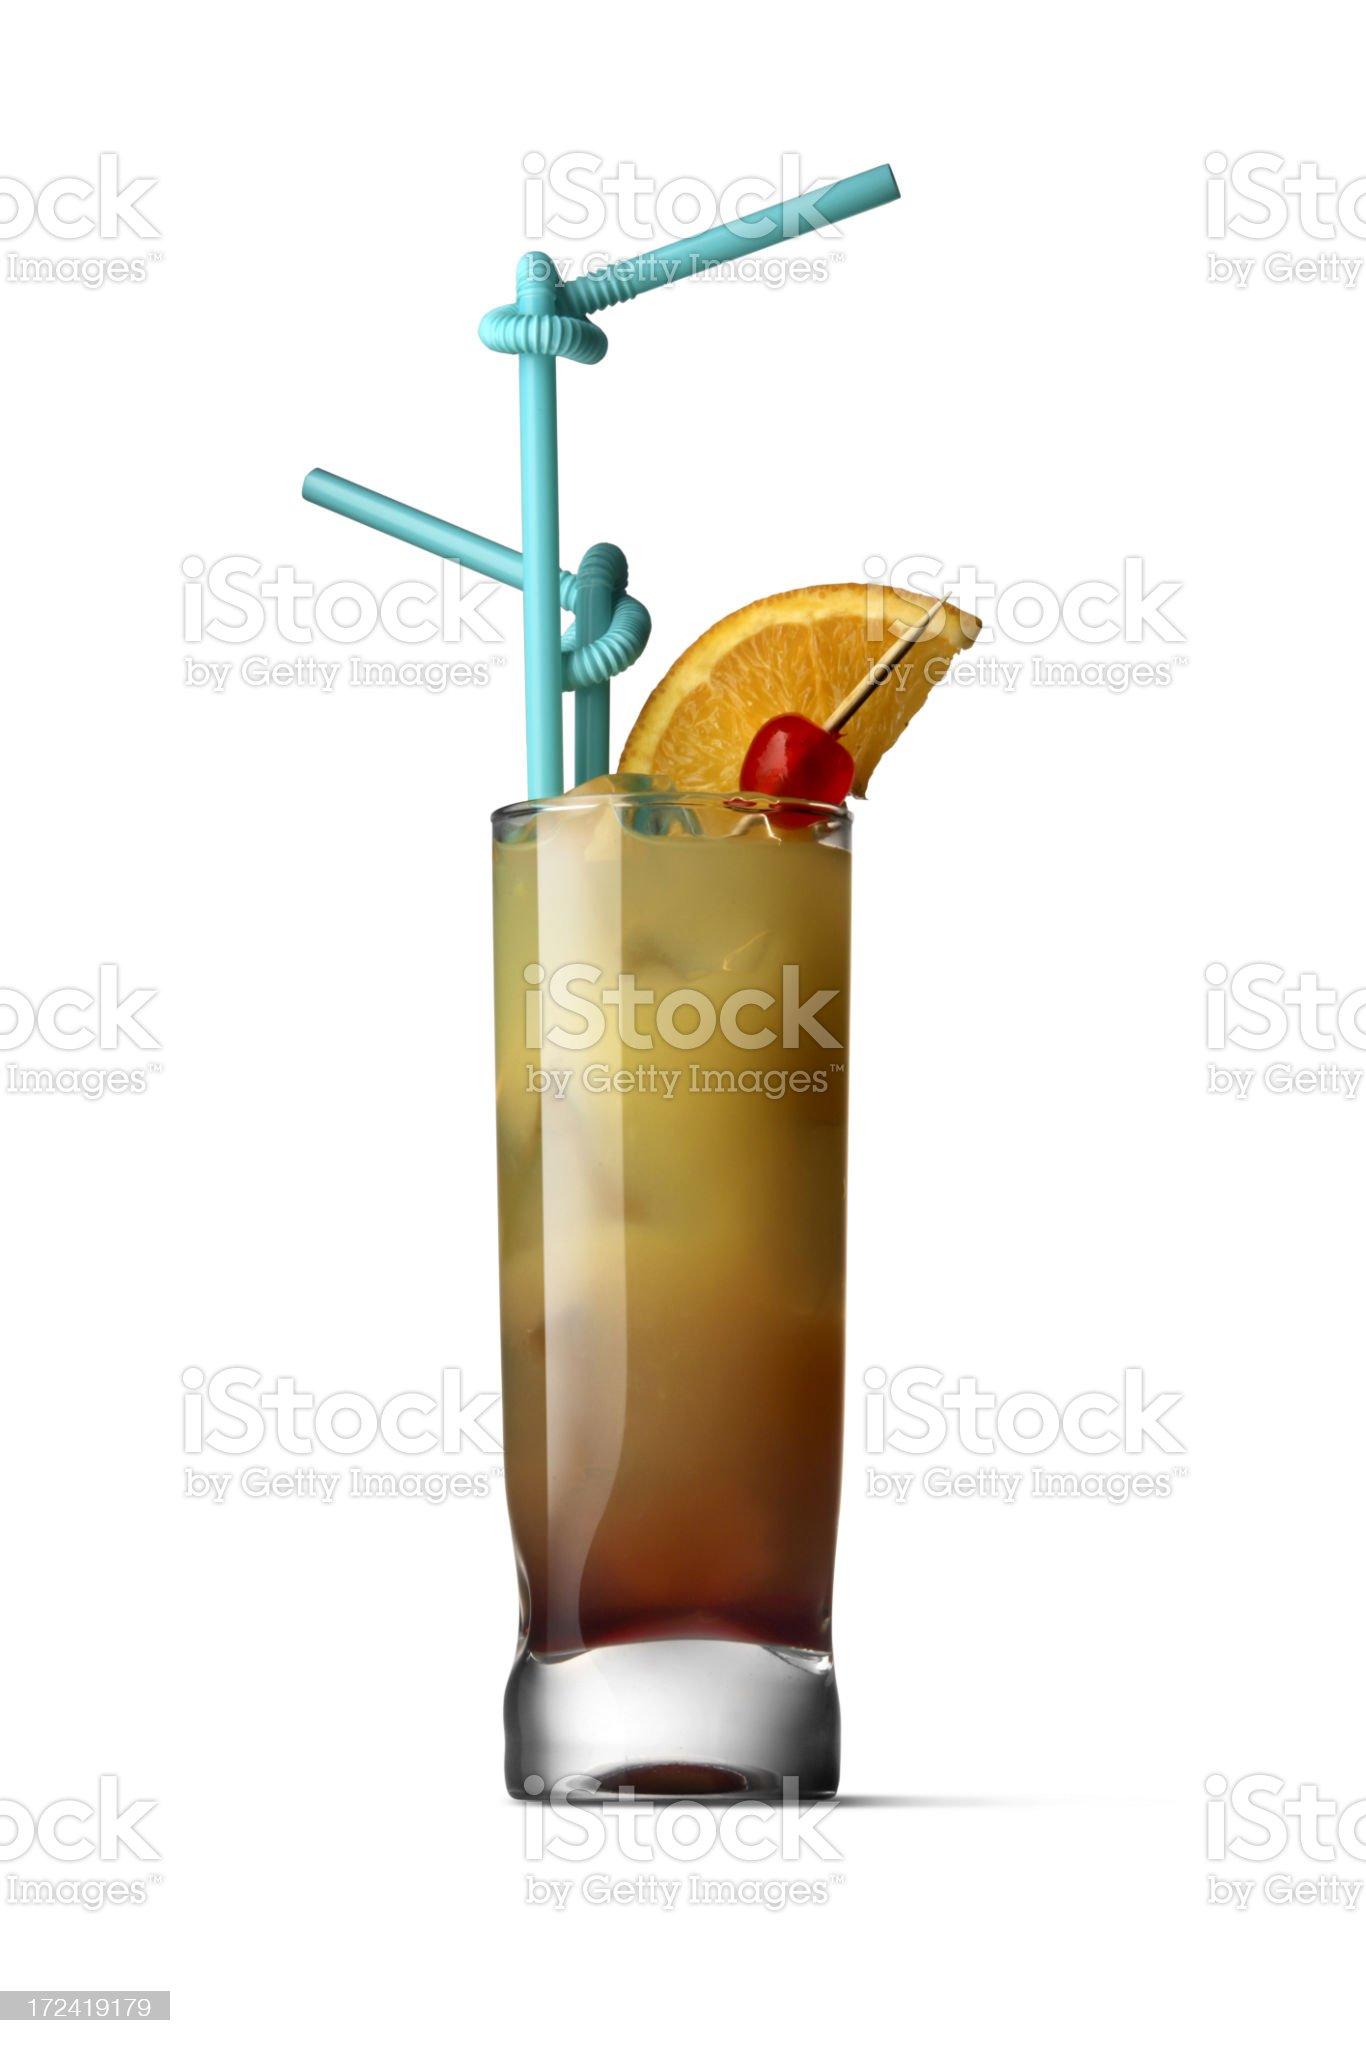 Drinks: Tequila Sunrise royalty-free stock photo